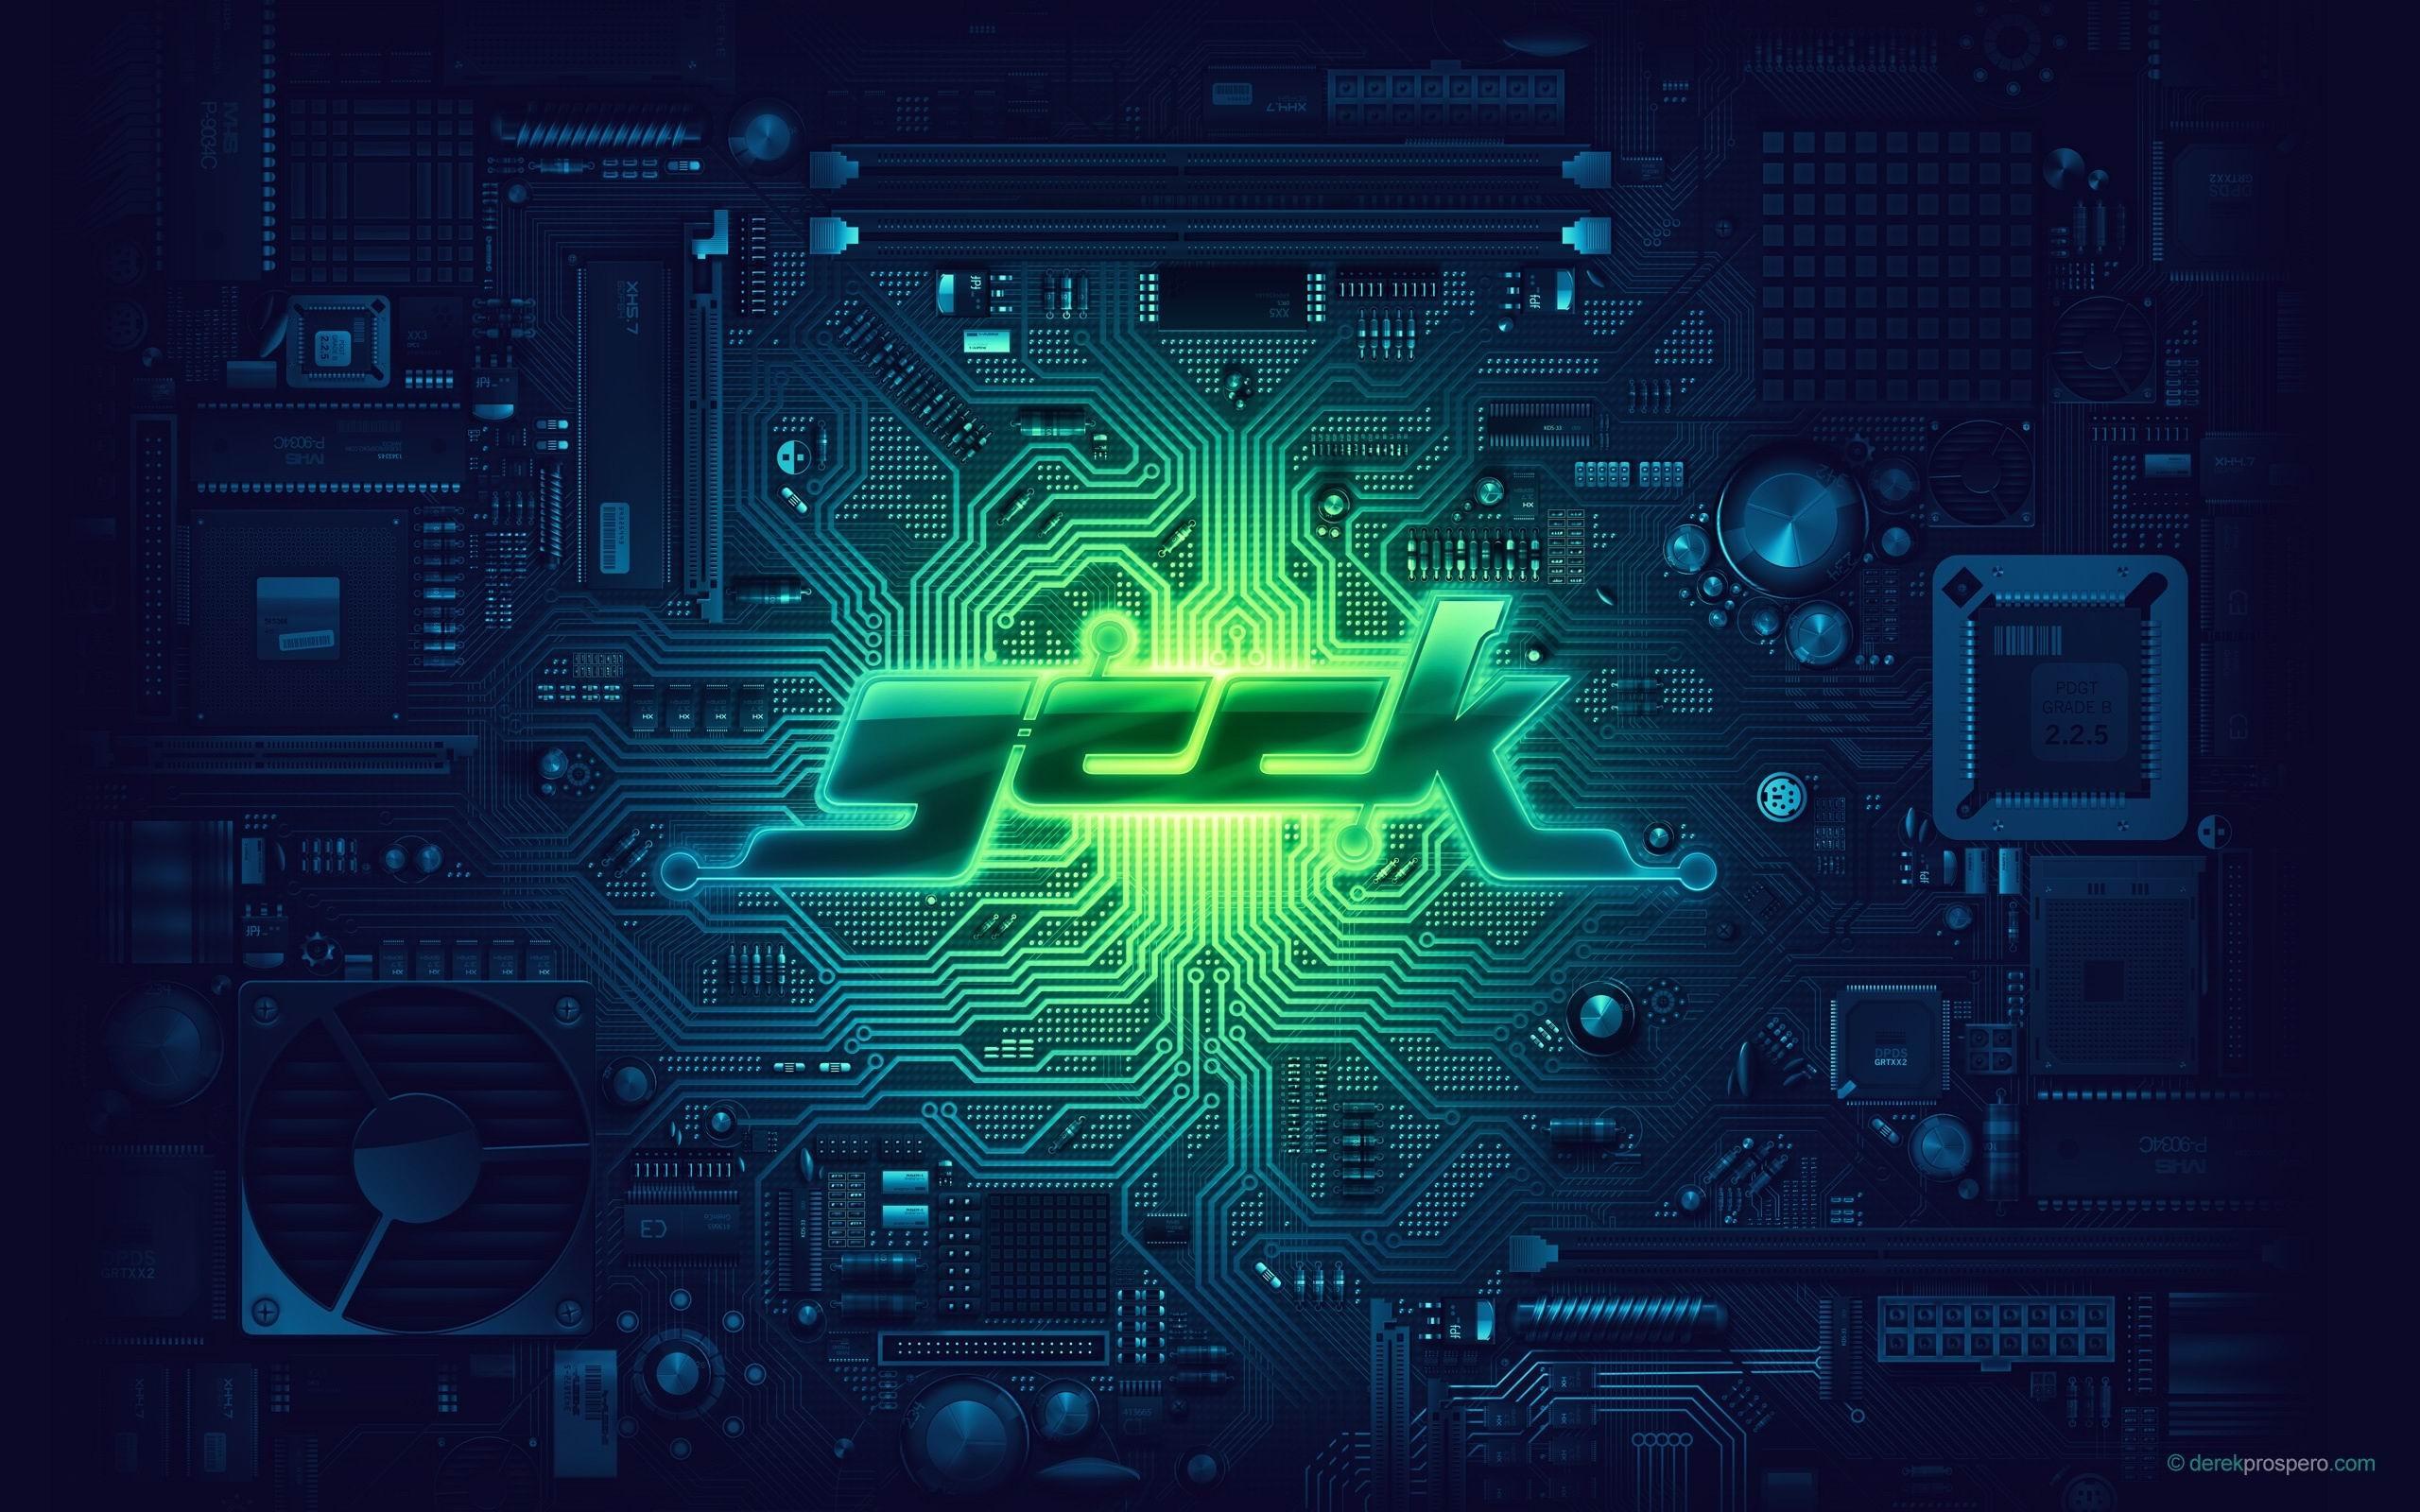 geek-creative graphics wallpaper preview   10wallpaper